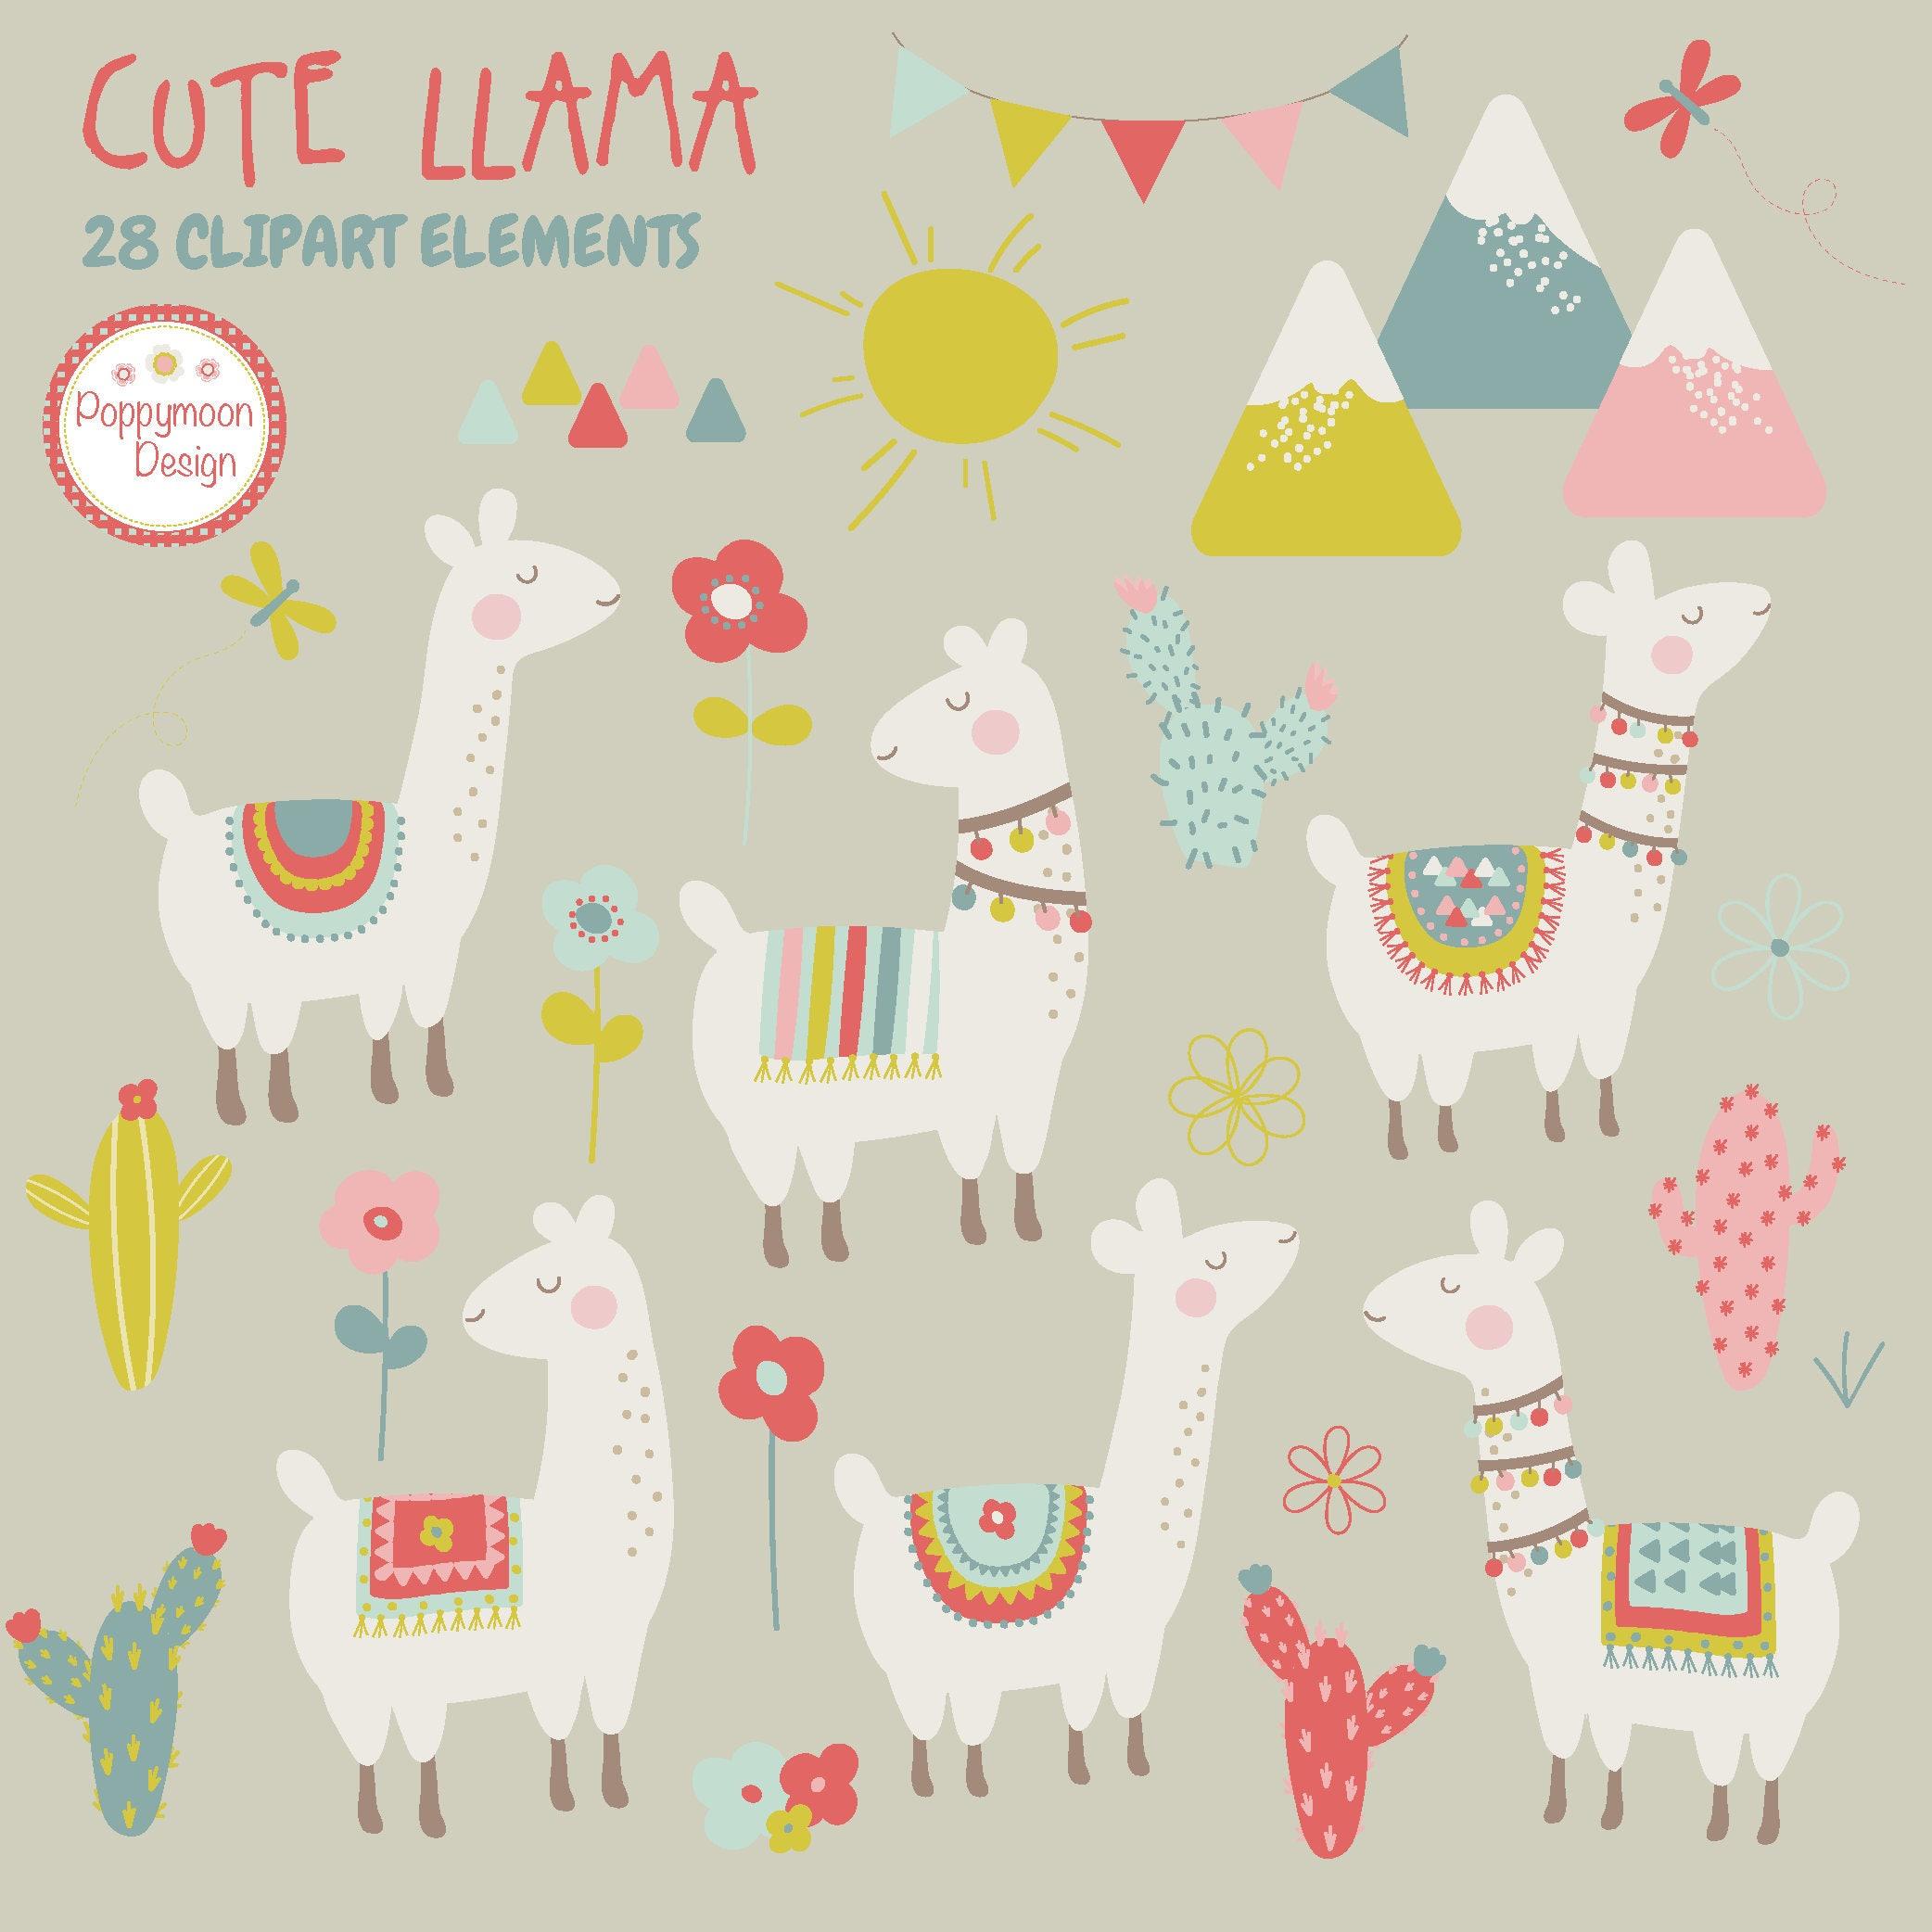 Cute llamas cactus and mountains printable digital clipart